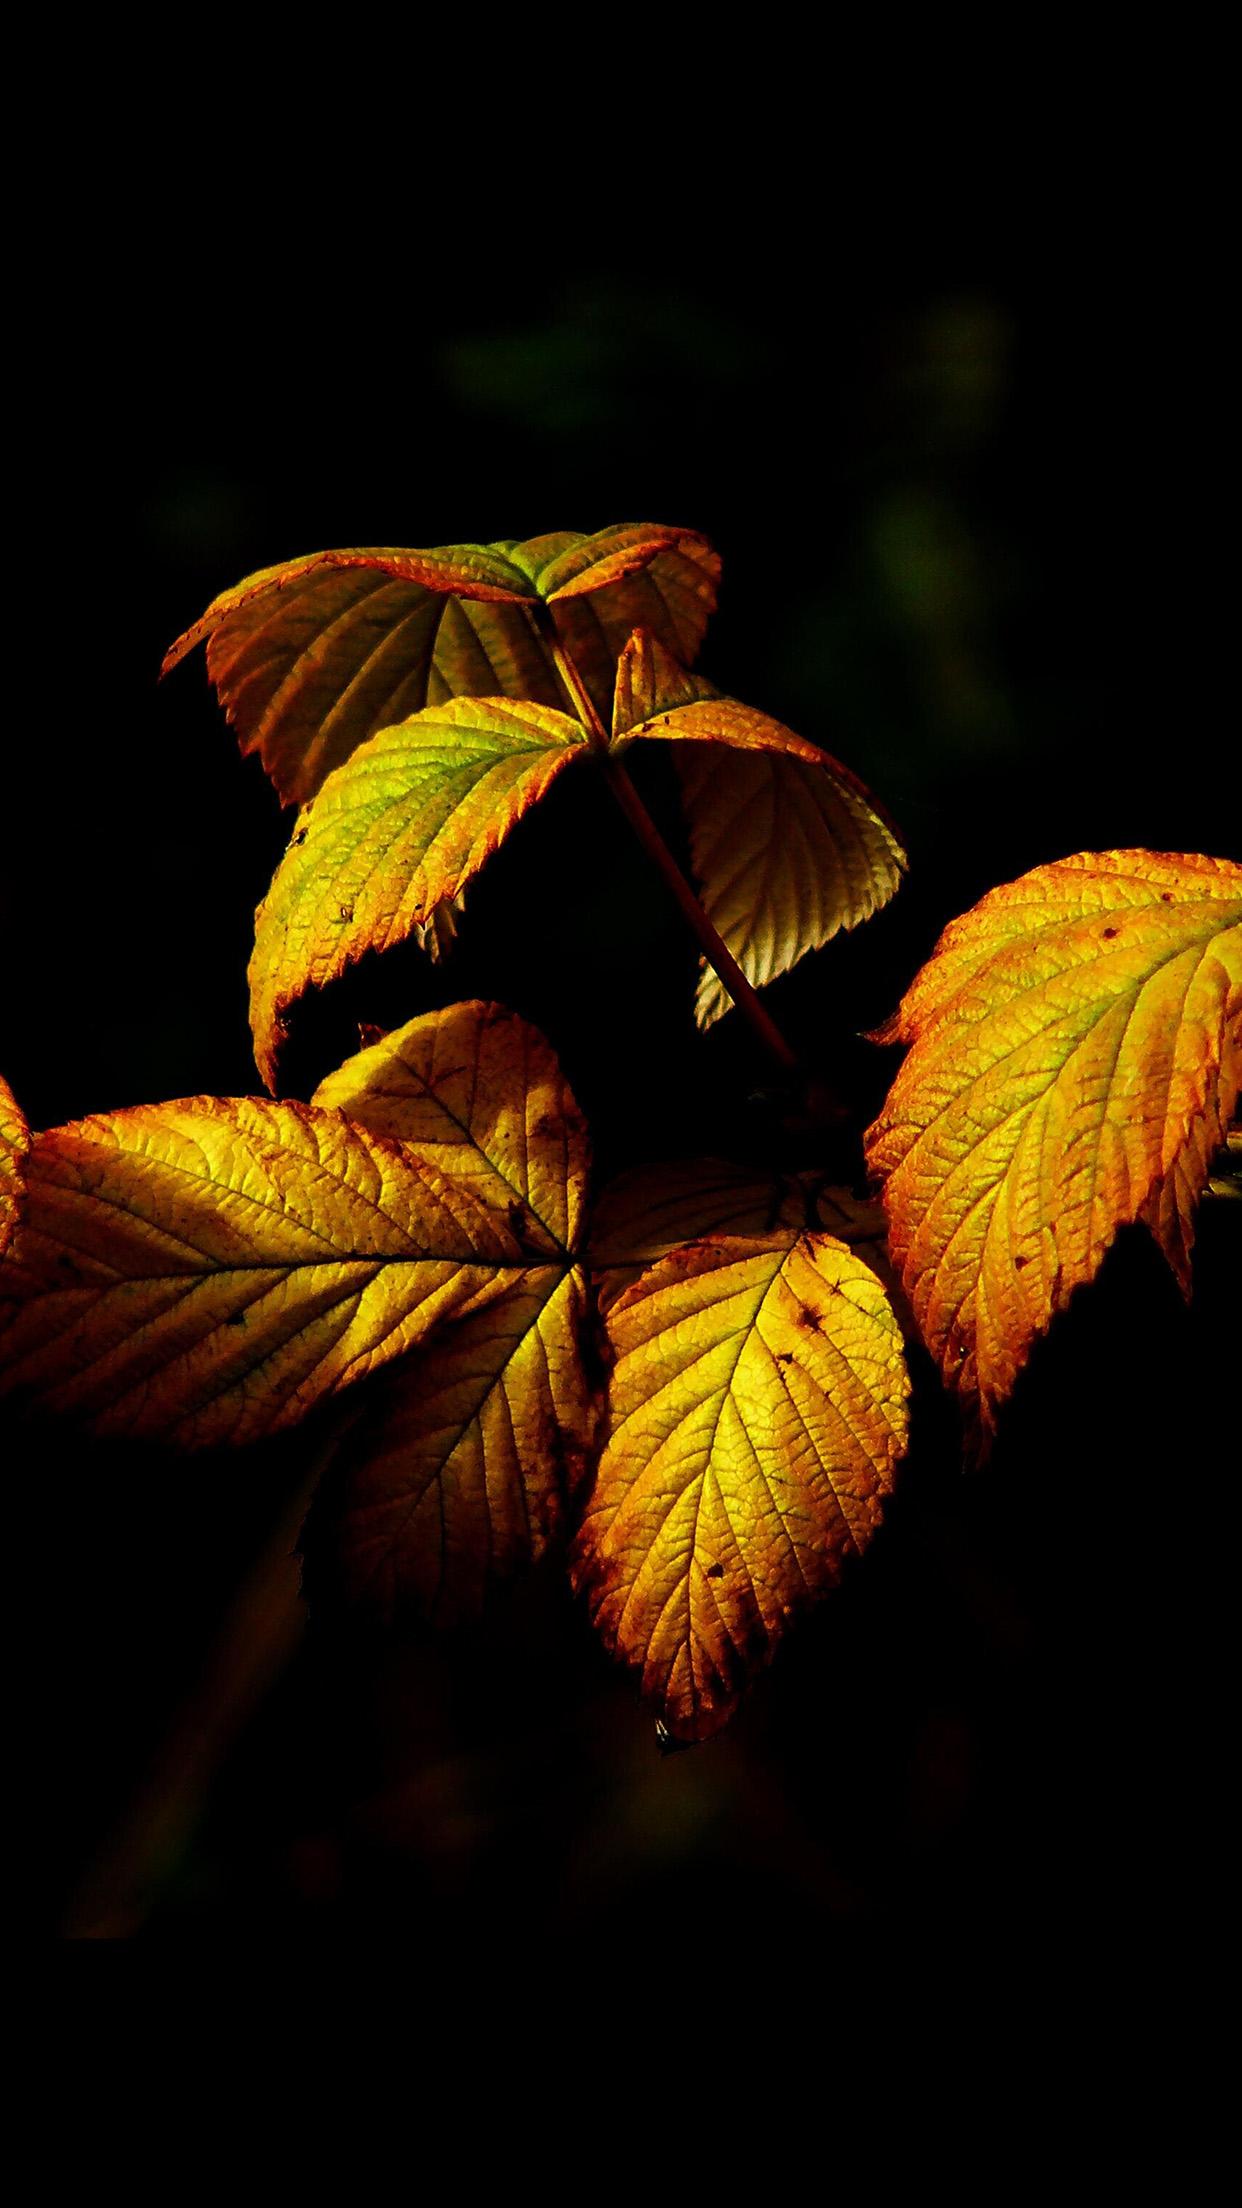 Fall Leaves iPhone 7 Wallpaper | iDrop News